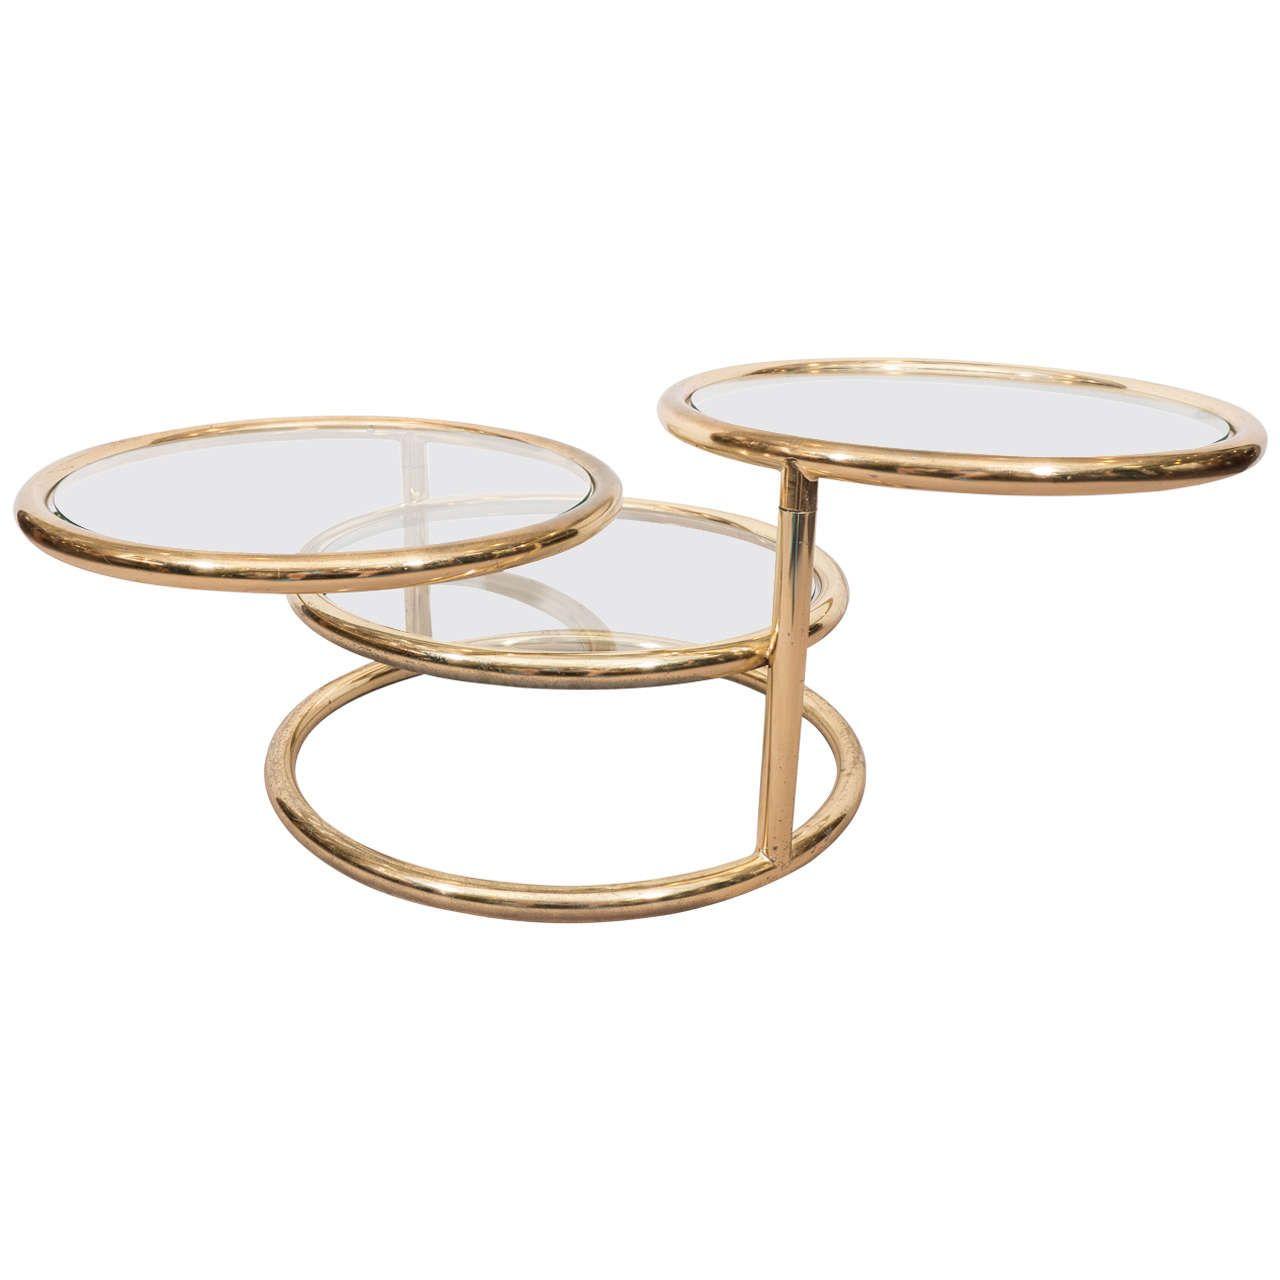 Milo Baughman Style Circular Three Tier Swivel Coffee Table In Polished Brass 1stdibs Com Baughman Polished Brass Coffee Table